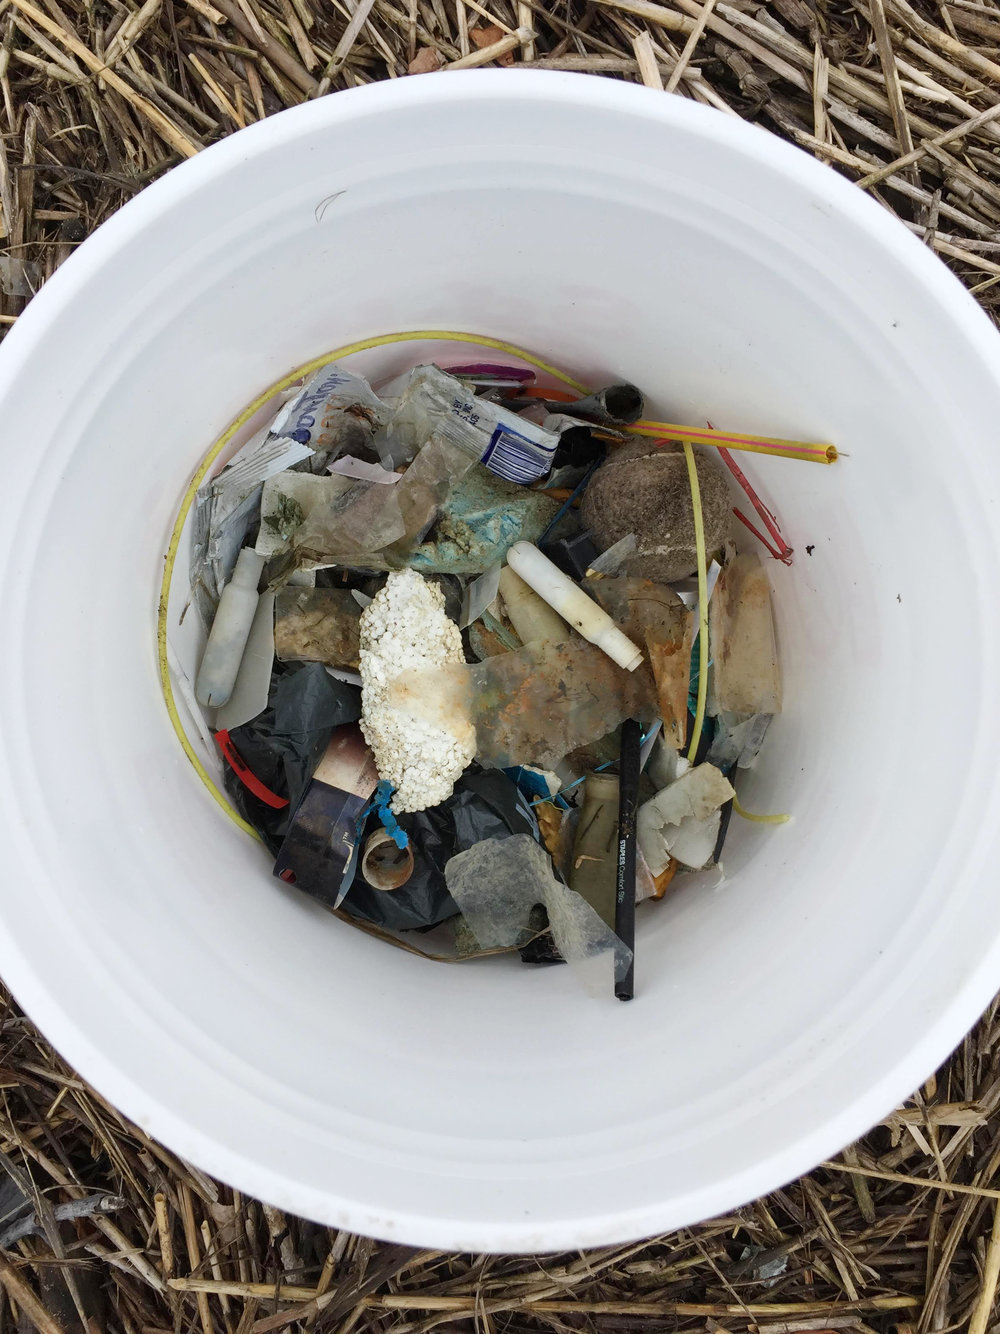 amy_chen_design_sandy_hook_beach_clean_bucket.JPG